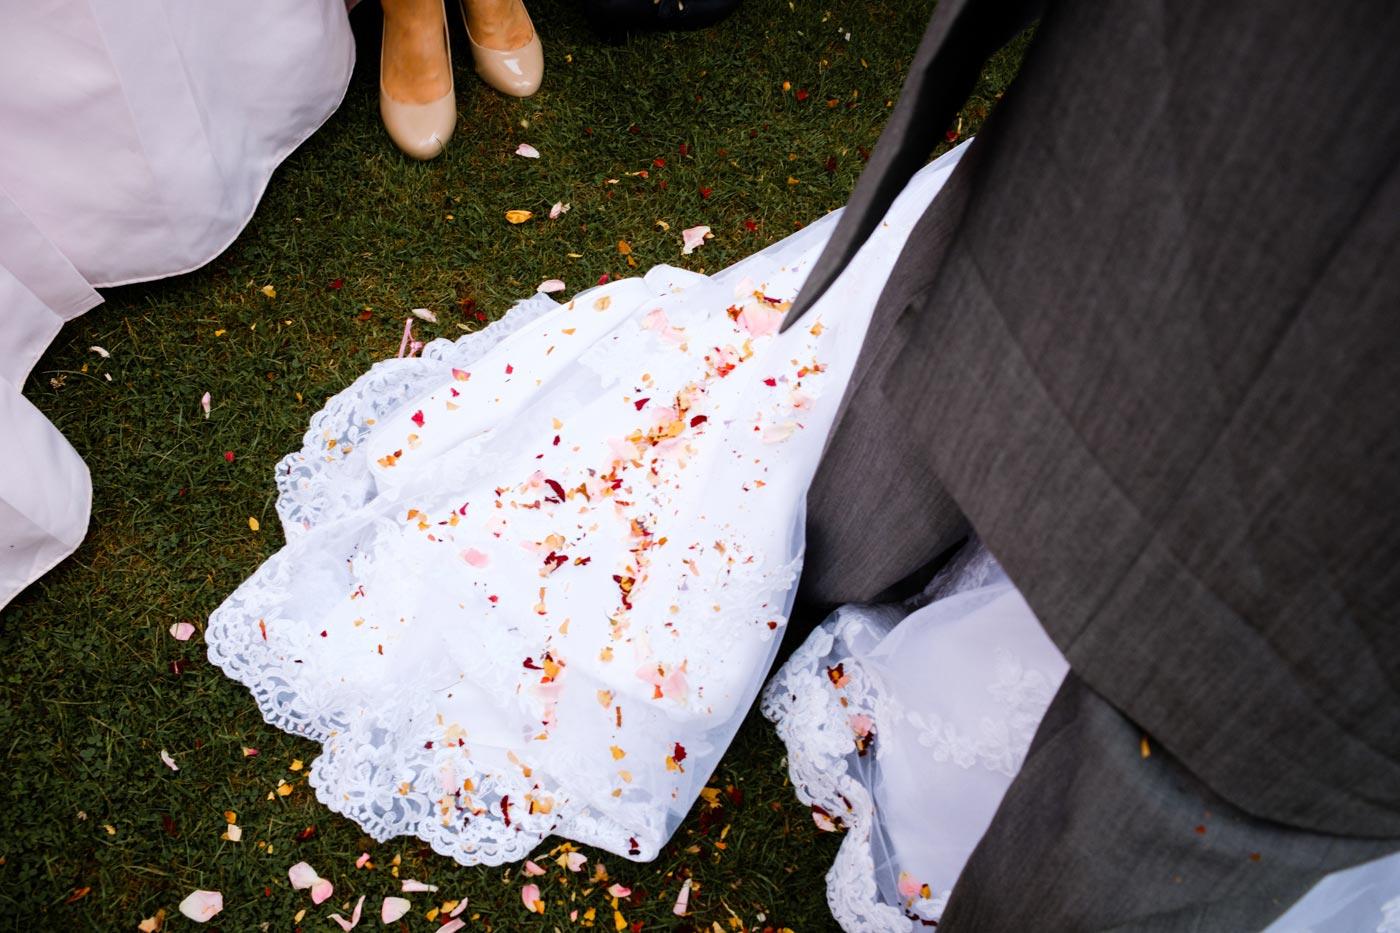 Confetti on the bride's dress at Ettington Park Hotel